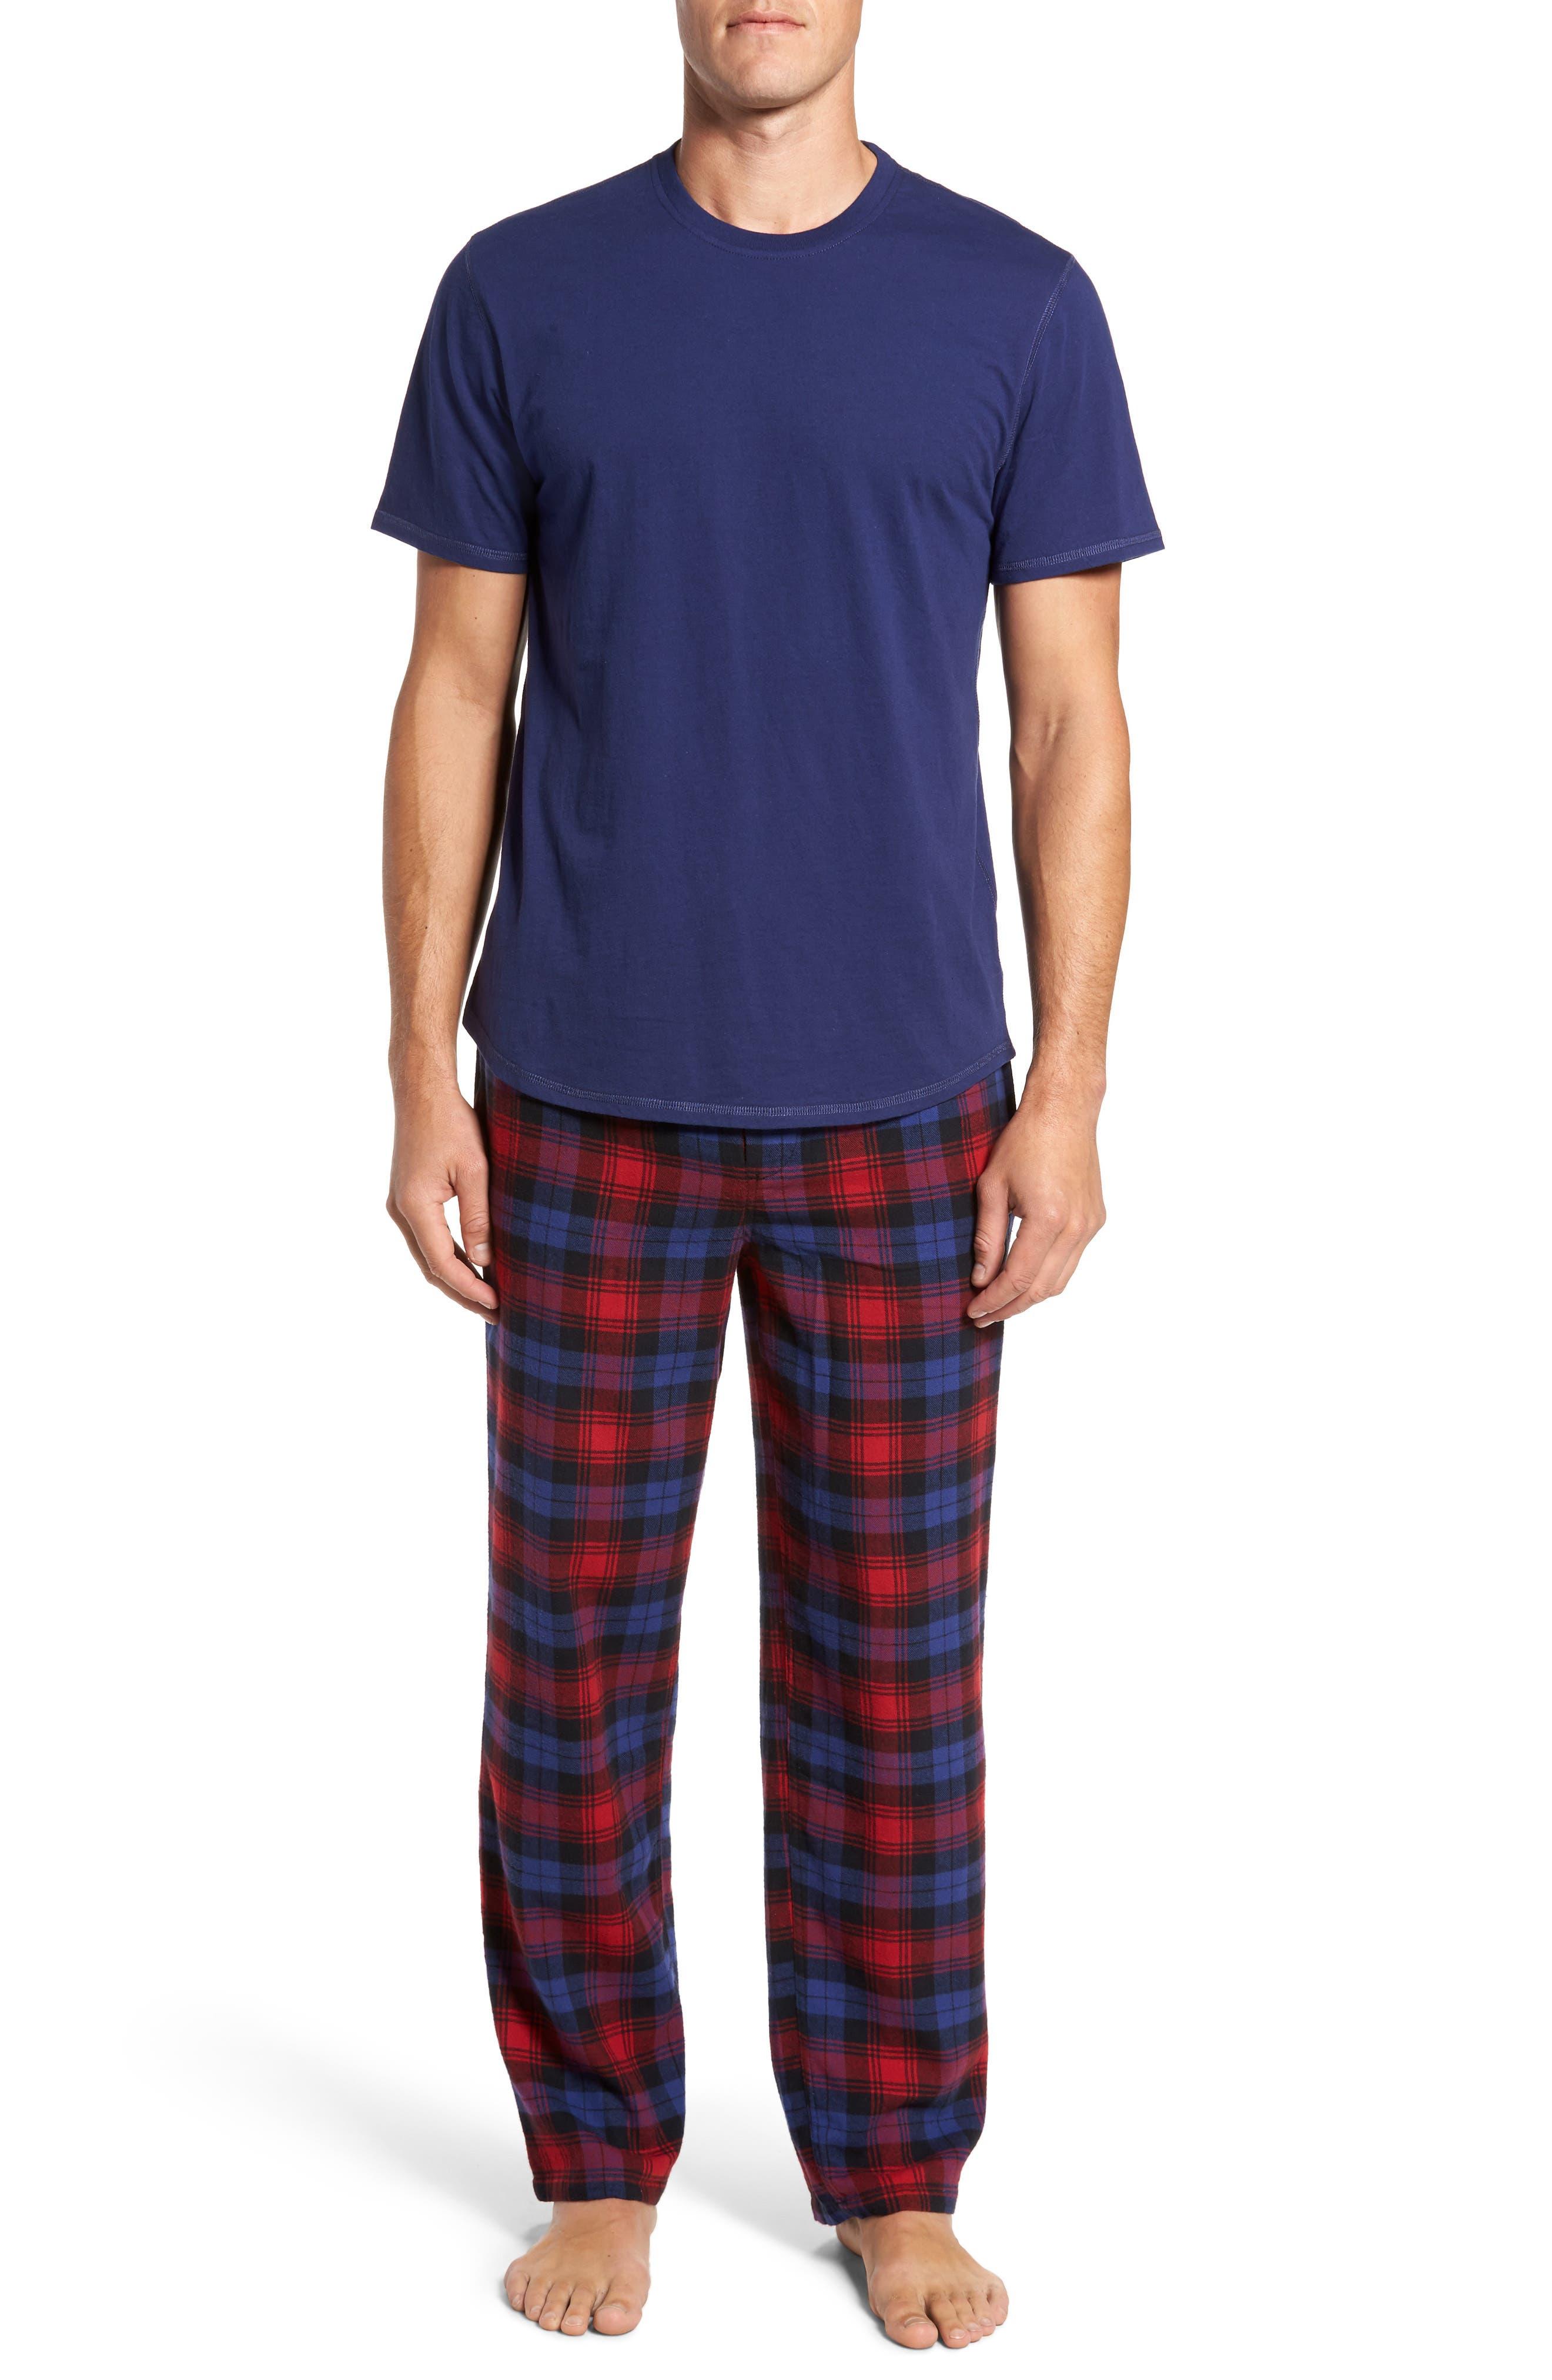 Nordstrom Men's Shop Pajama Set